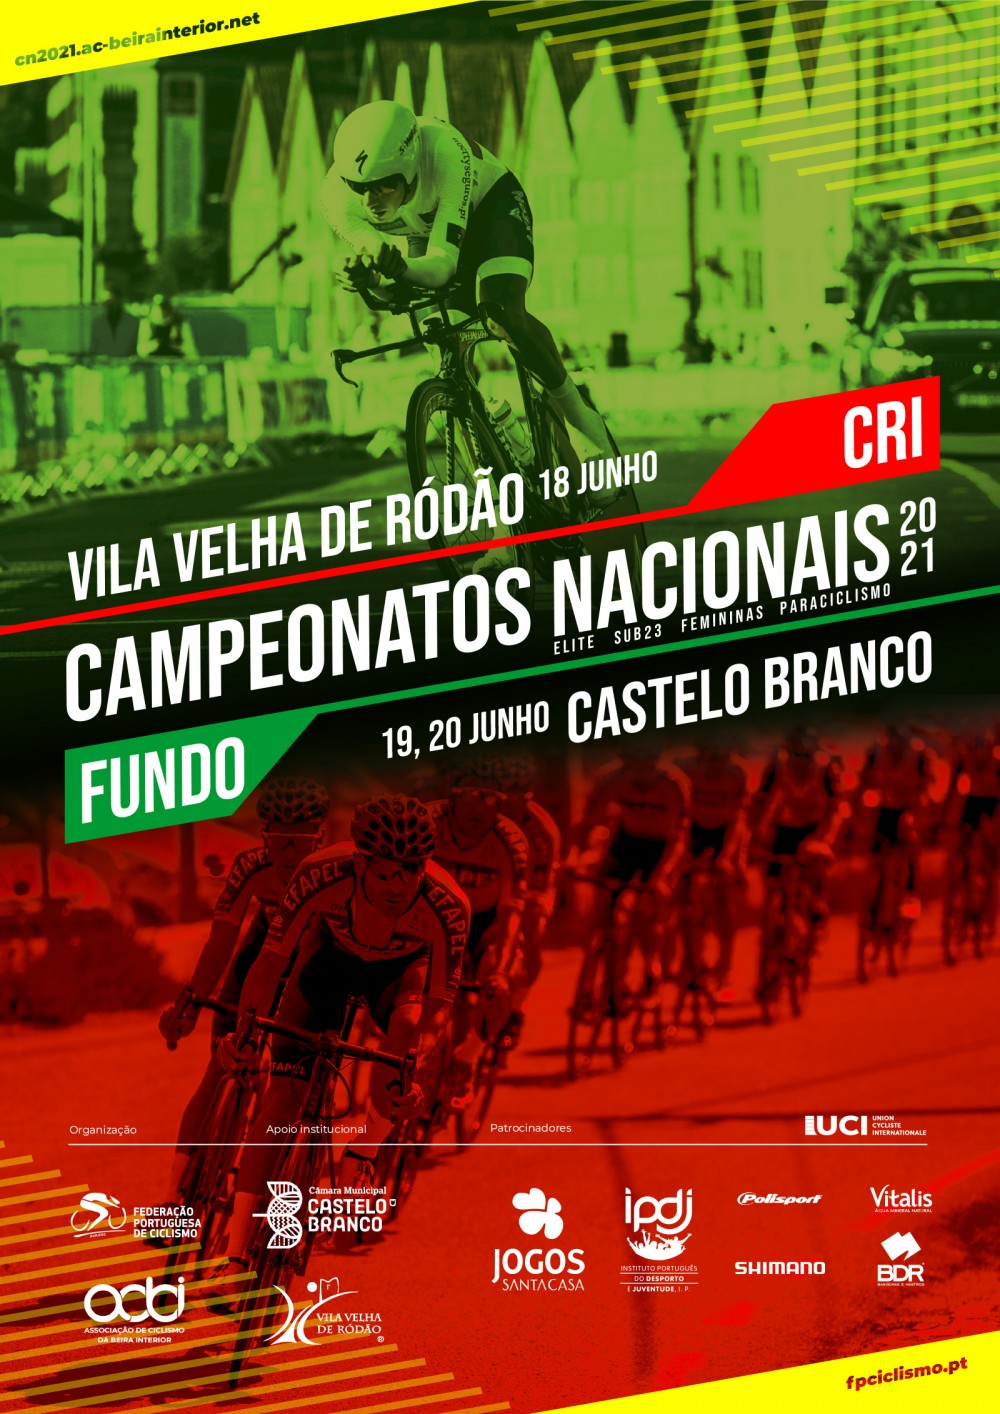 Campeonato Nacional Fundo Elite